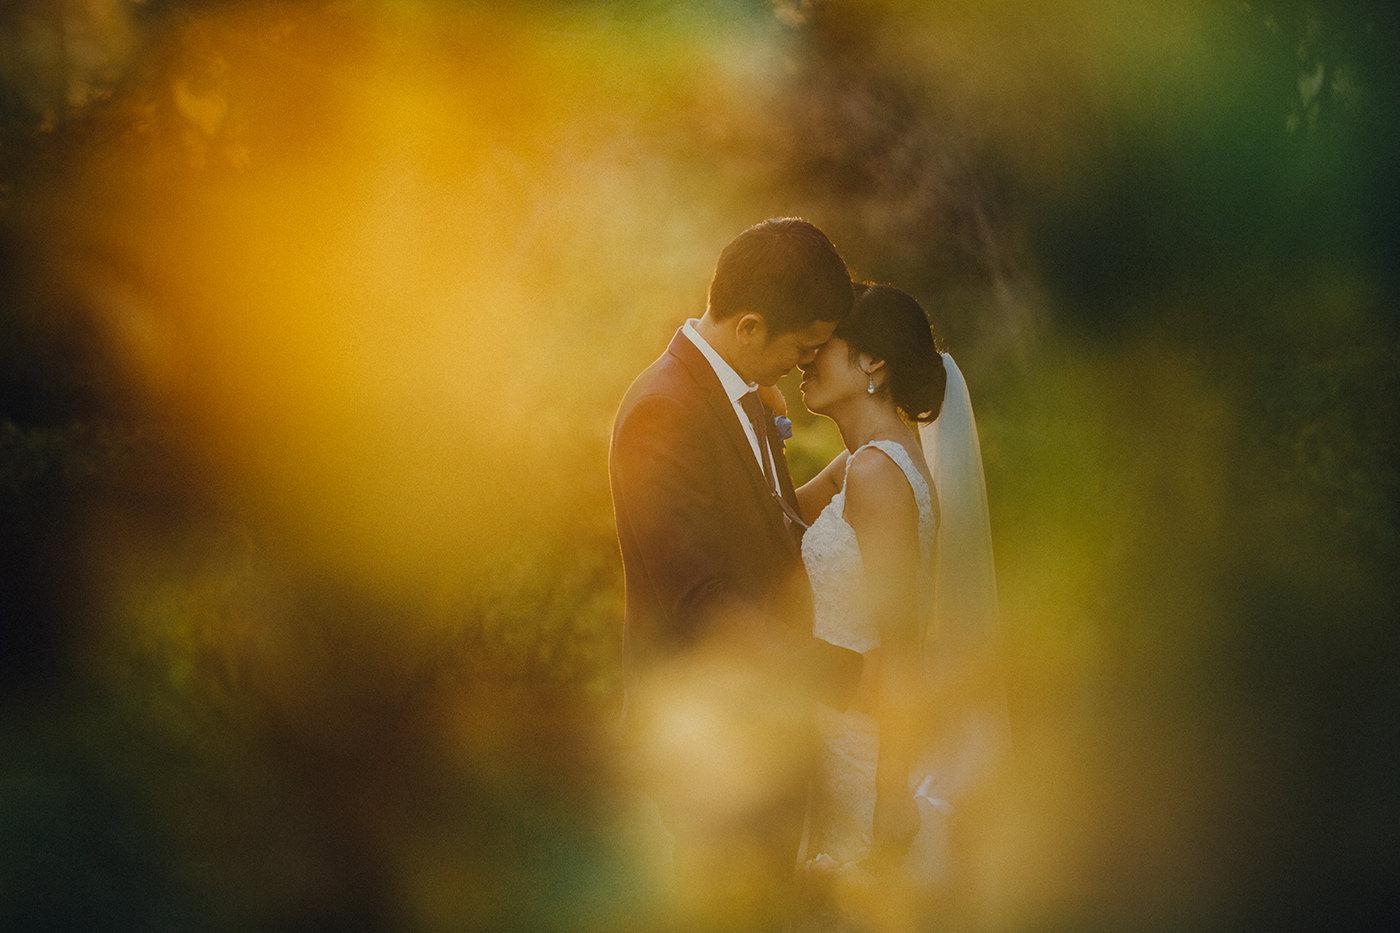 wedding_photographer_nz-00034.jpg